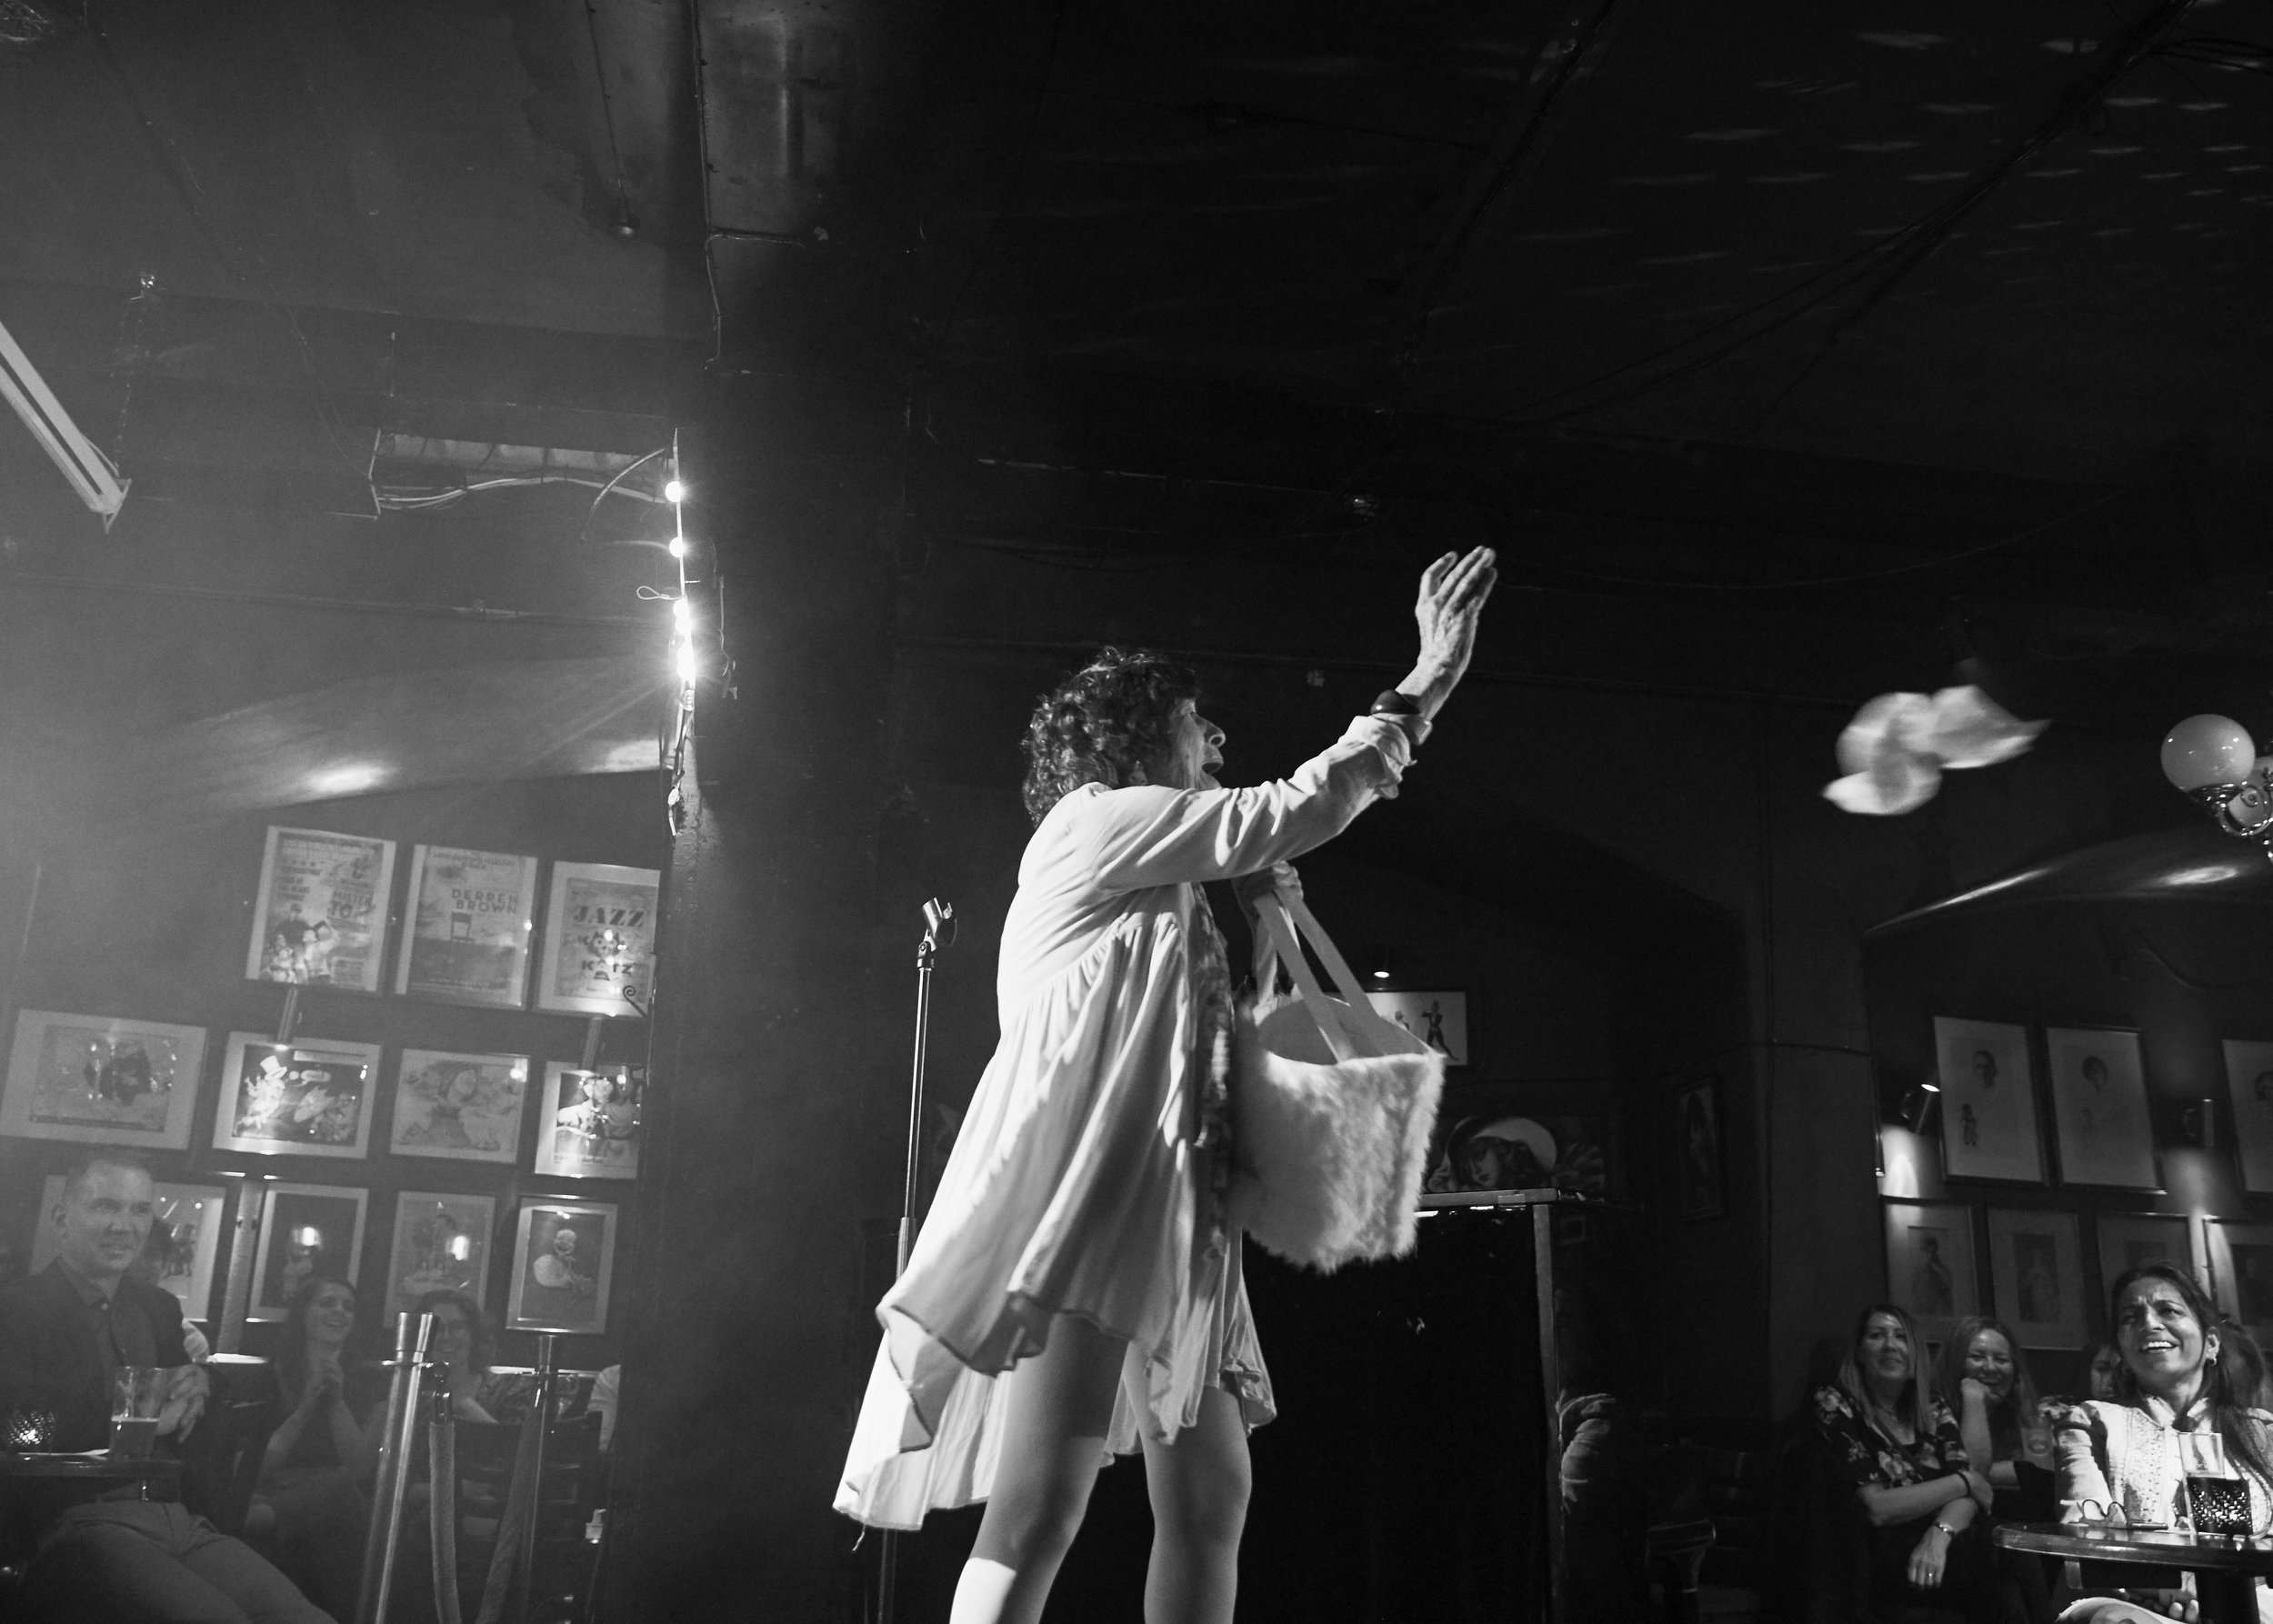 Lynn_Ruth Miller_Underbelly_Festival_2019_Photography_Marc_Abe_5.jpg